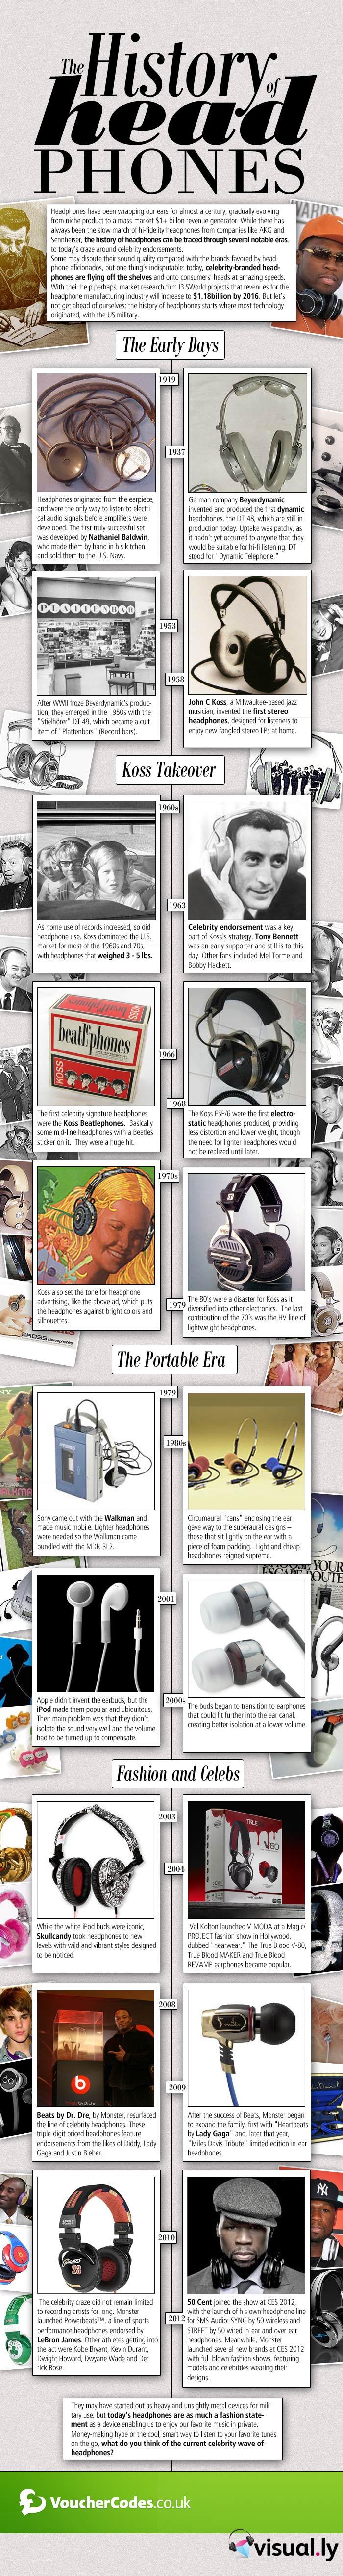 the-history-of-headphones